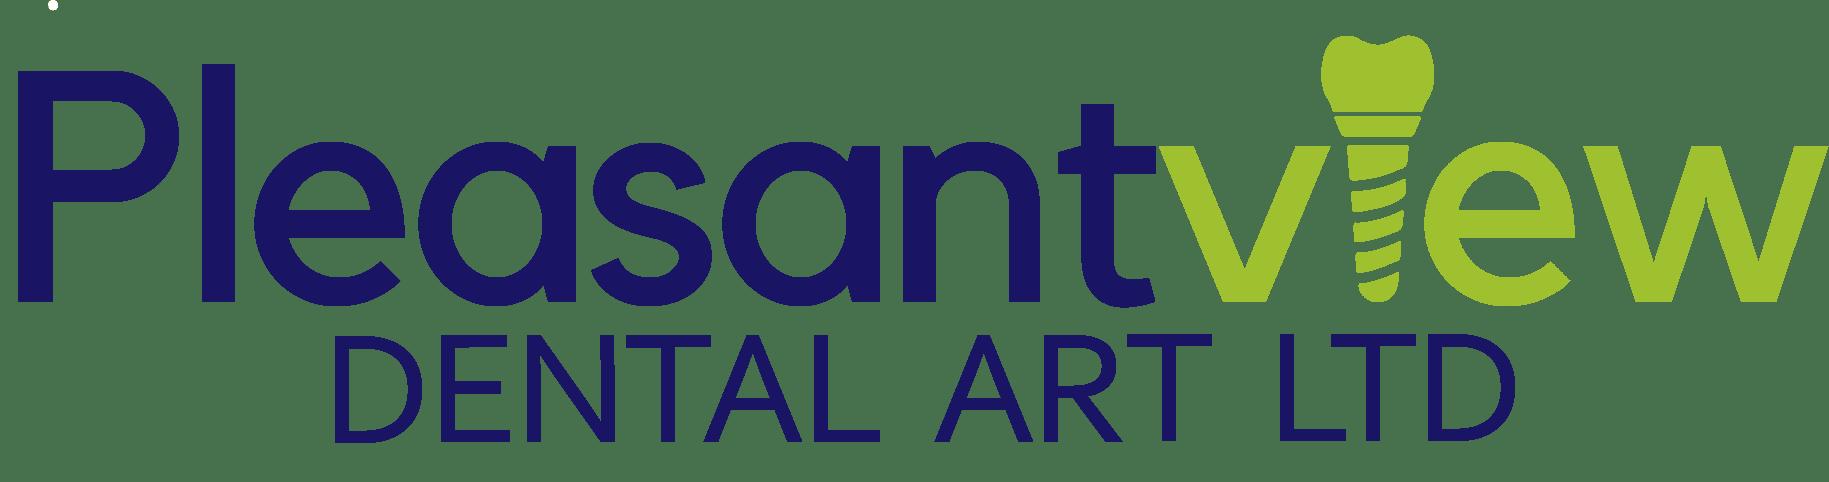 Pleasantview Dental Art Ltd